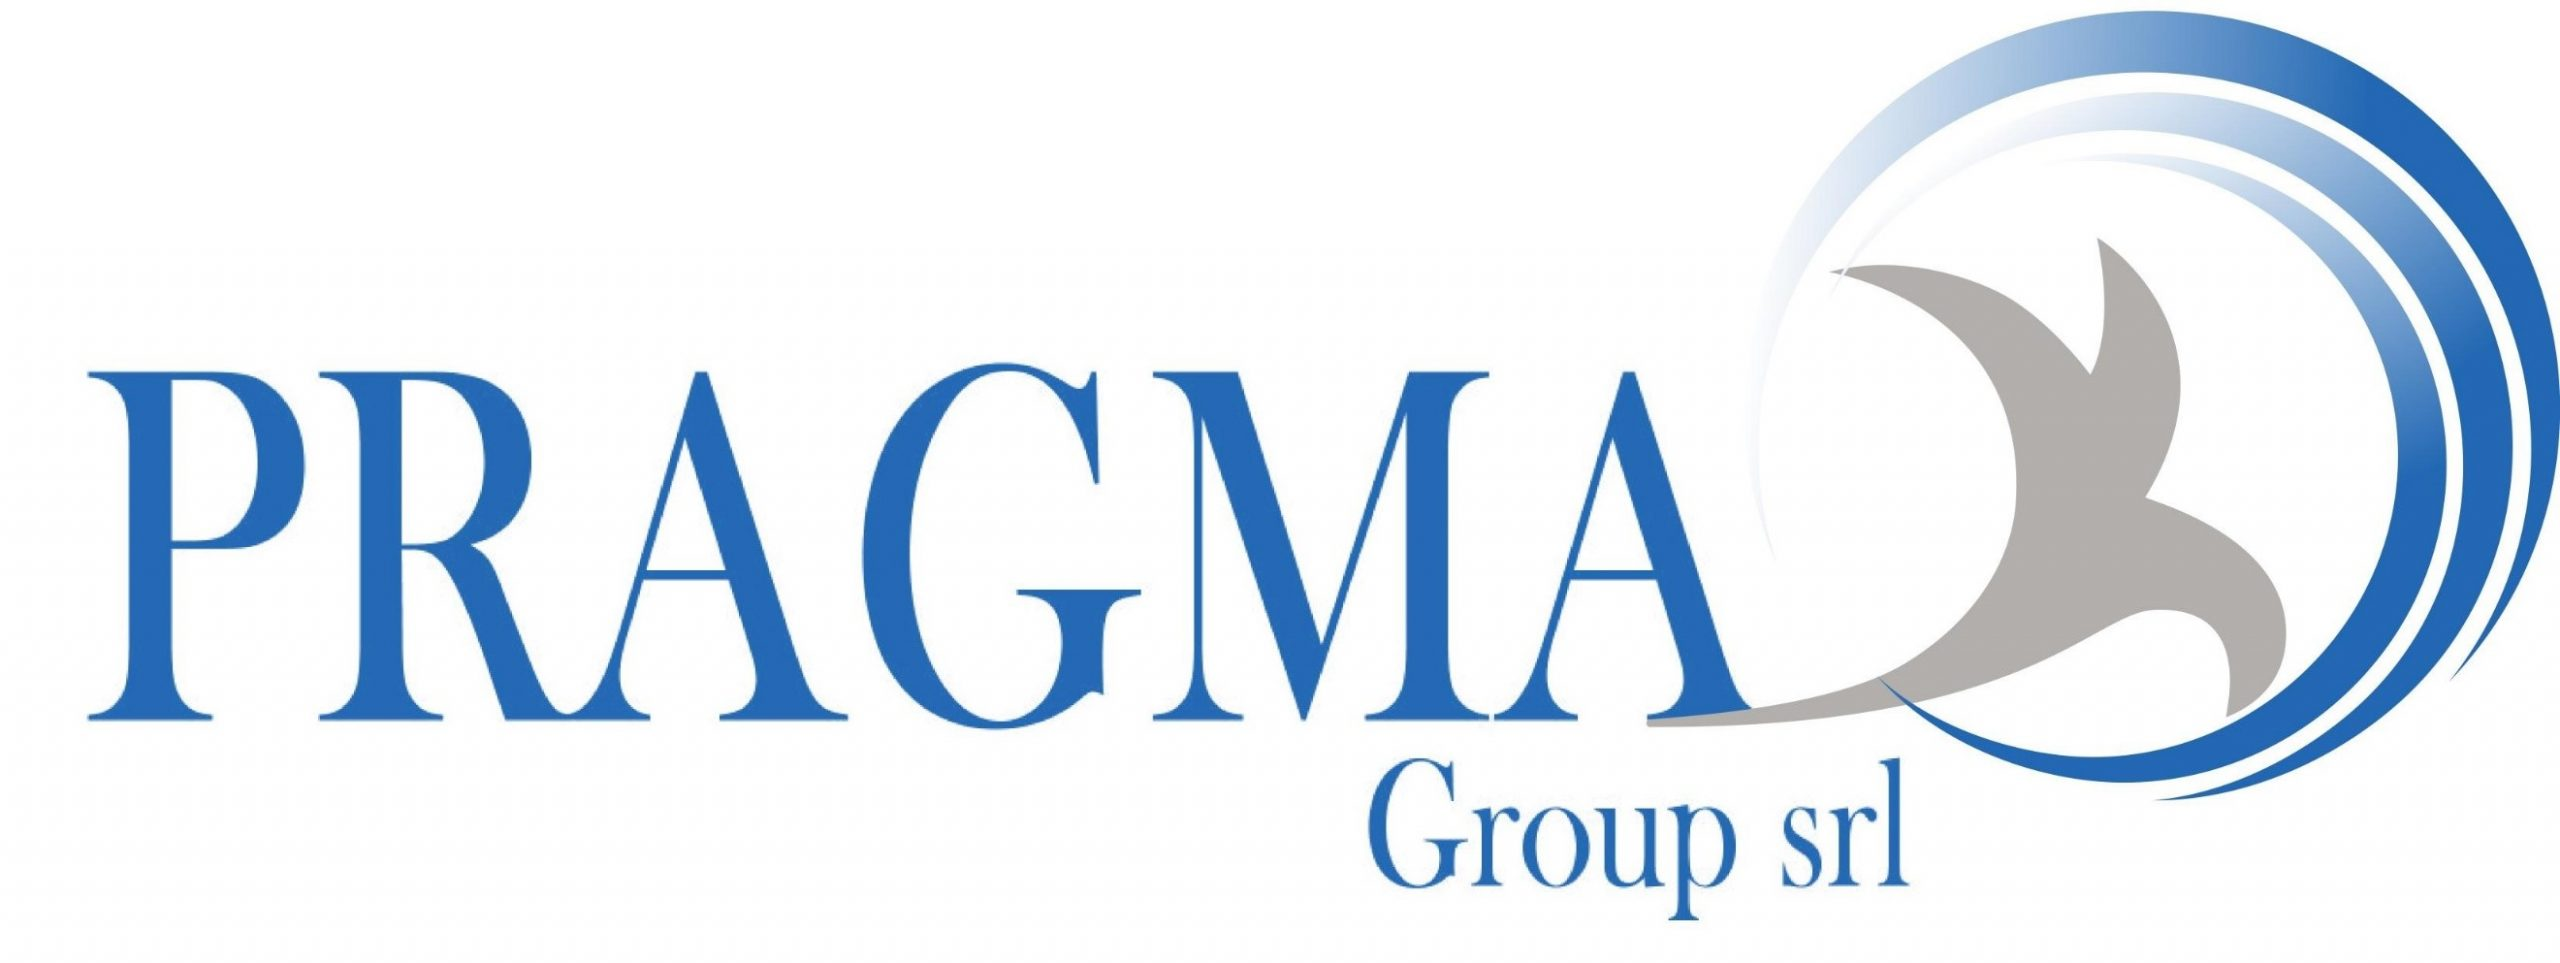 PRAGMA Group srl